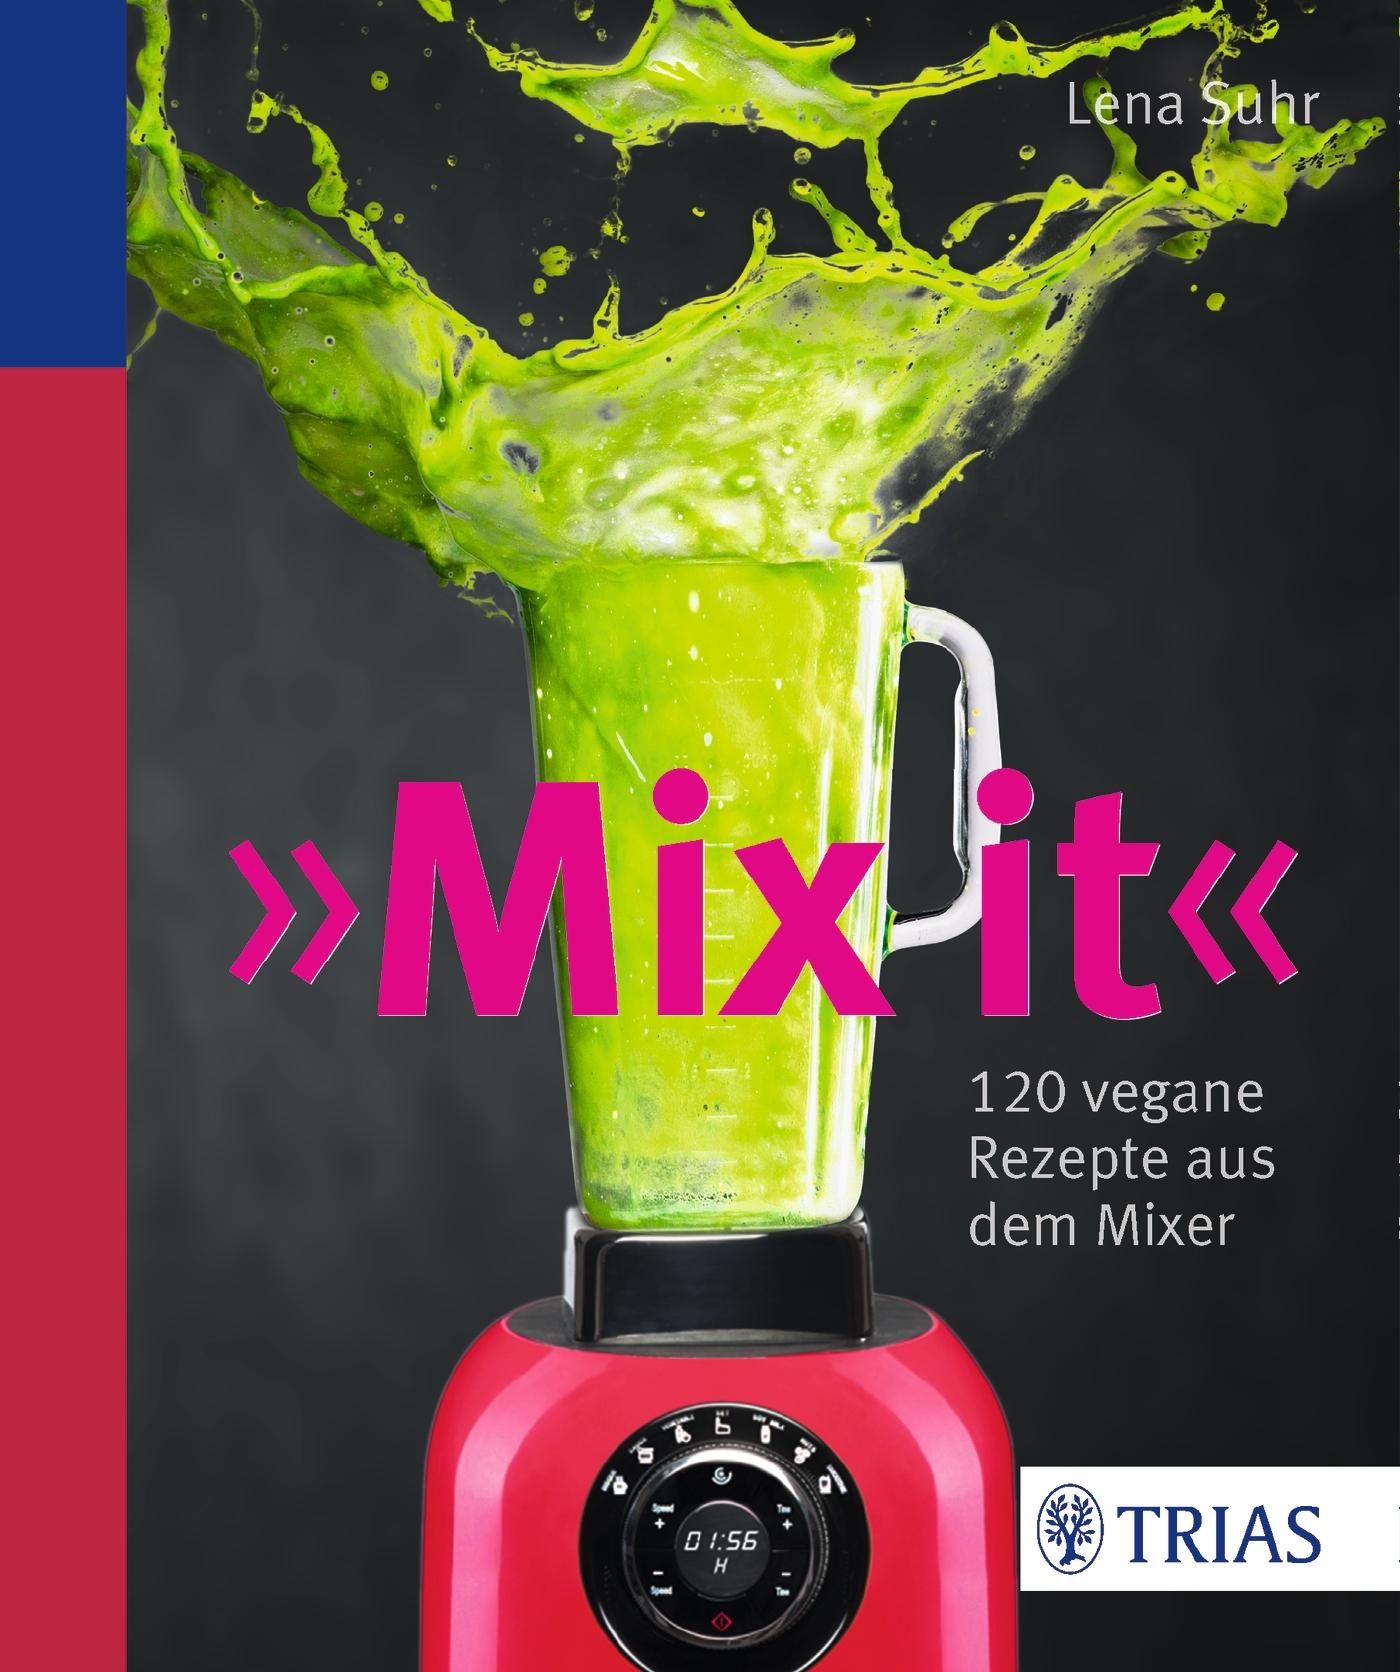 Mix it!